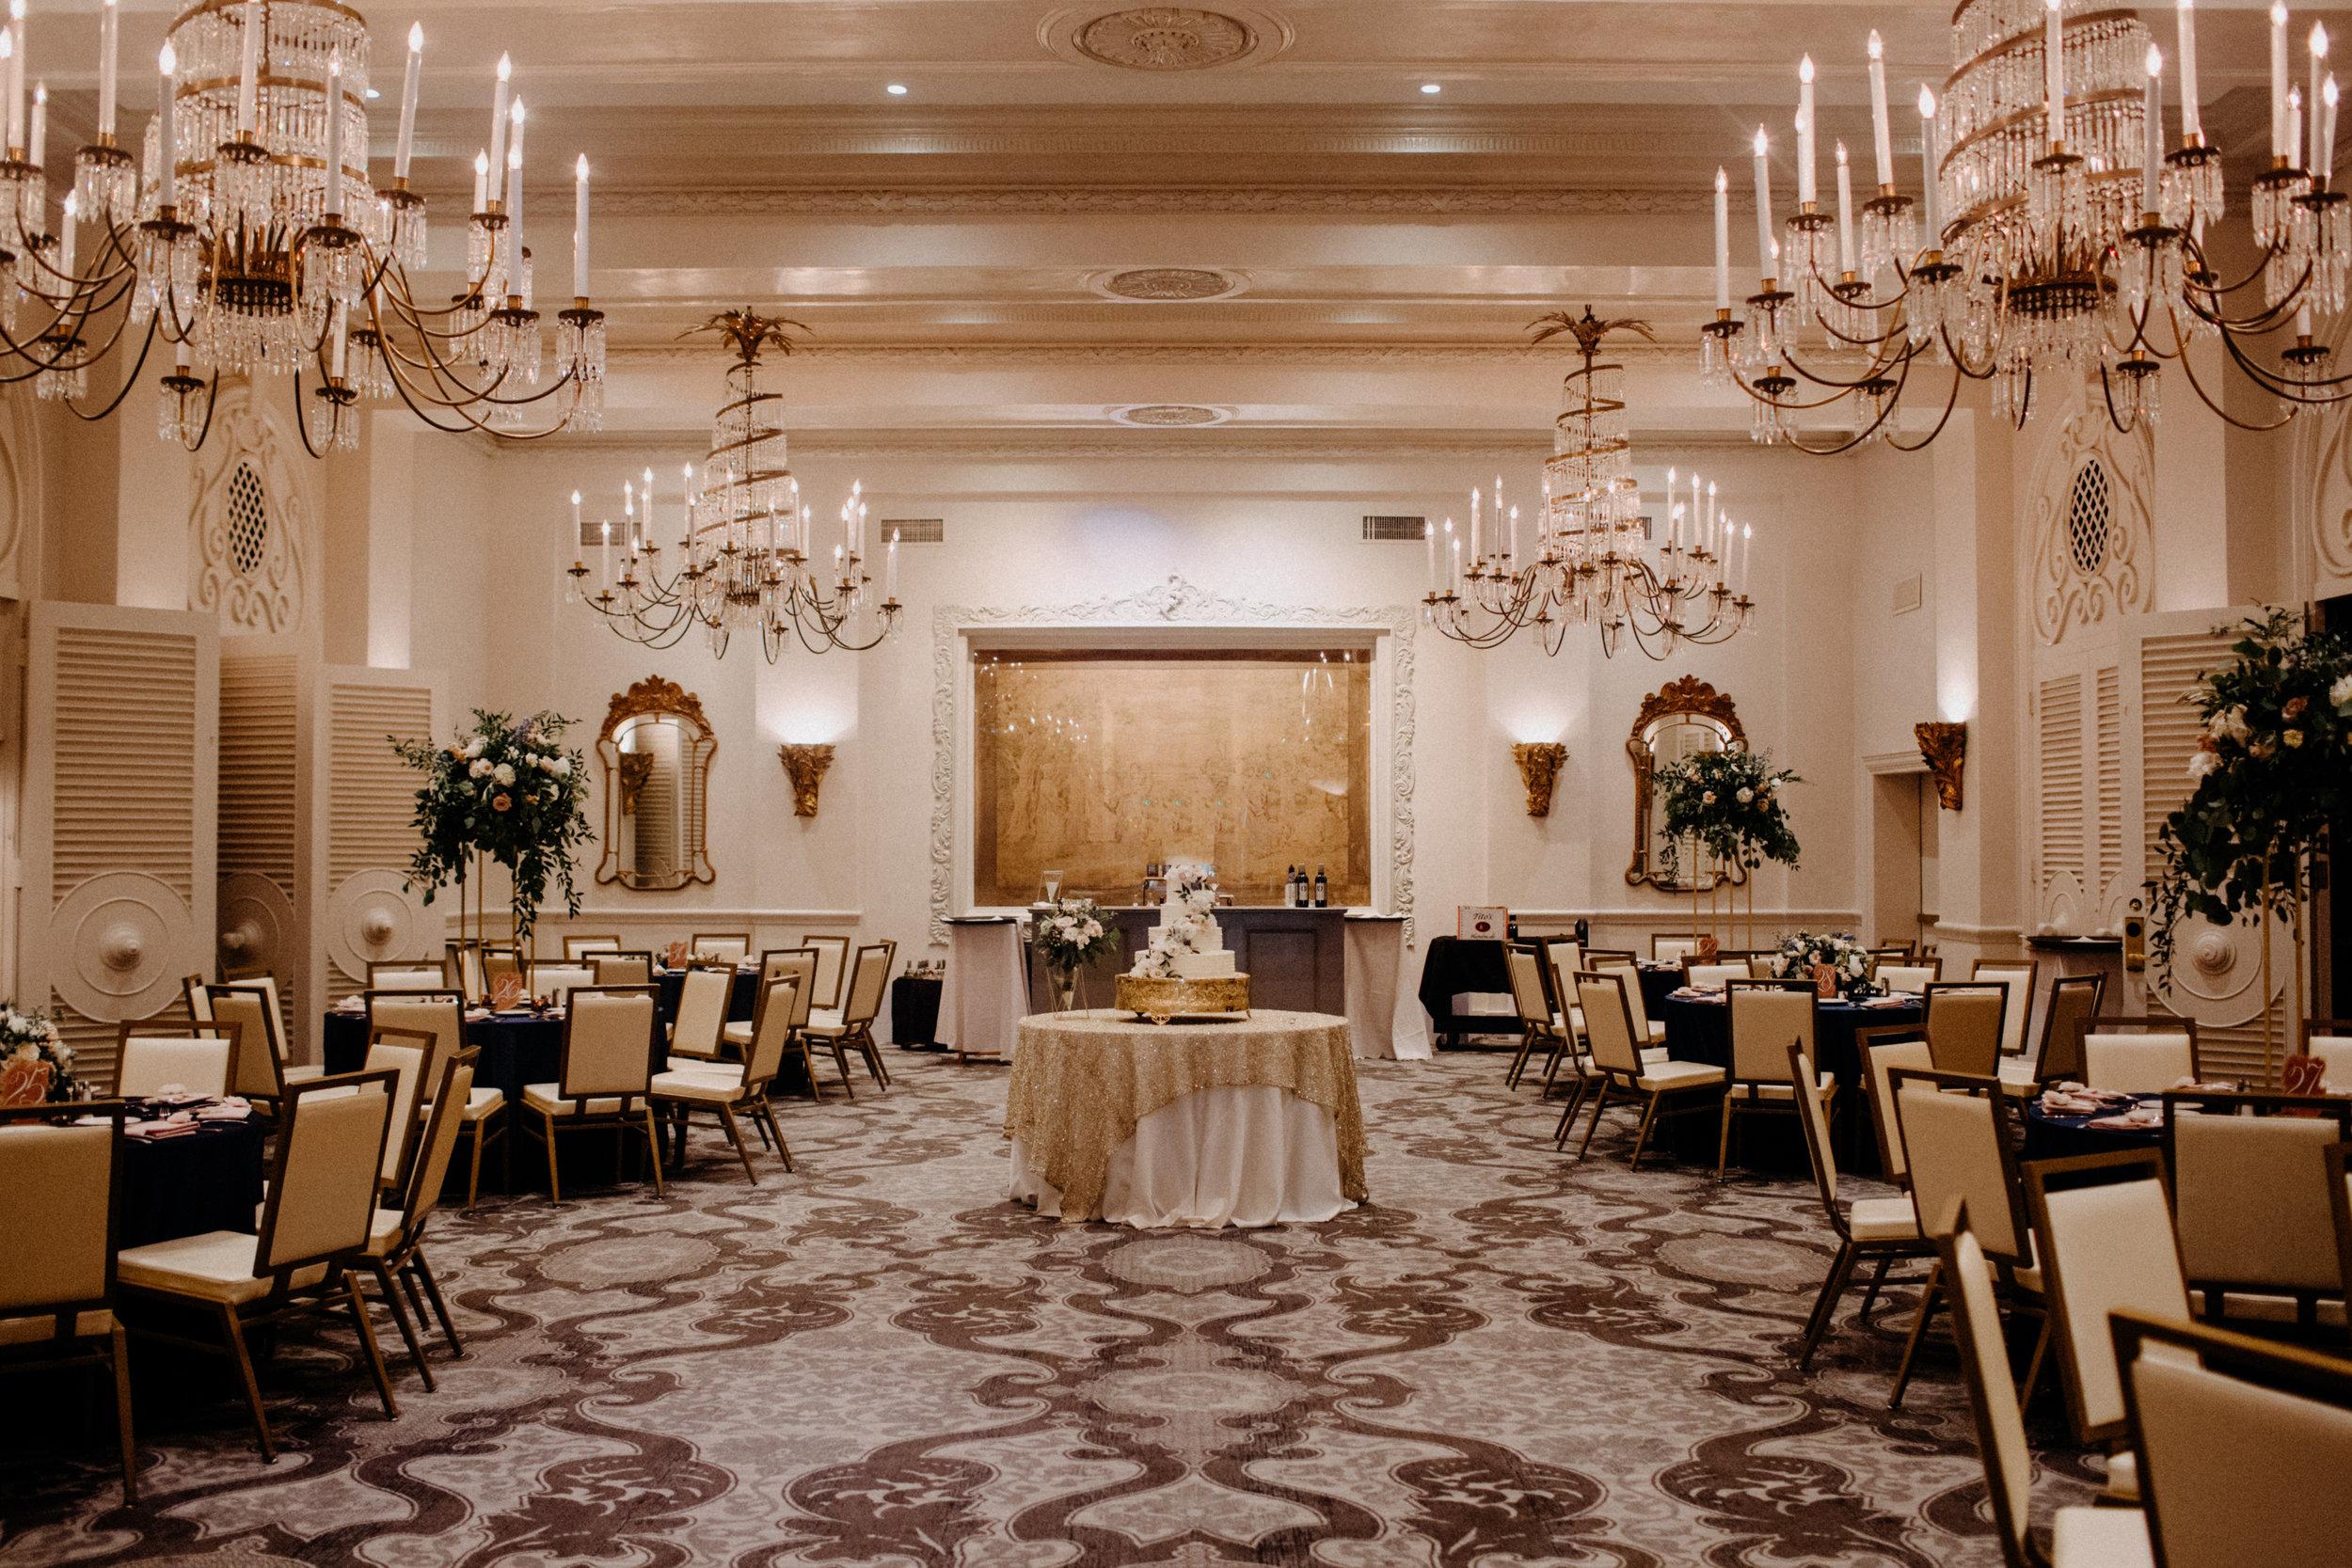 st-anthony-hotel-wedding-photography-10075san-antonio.JPG